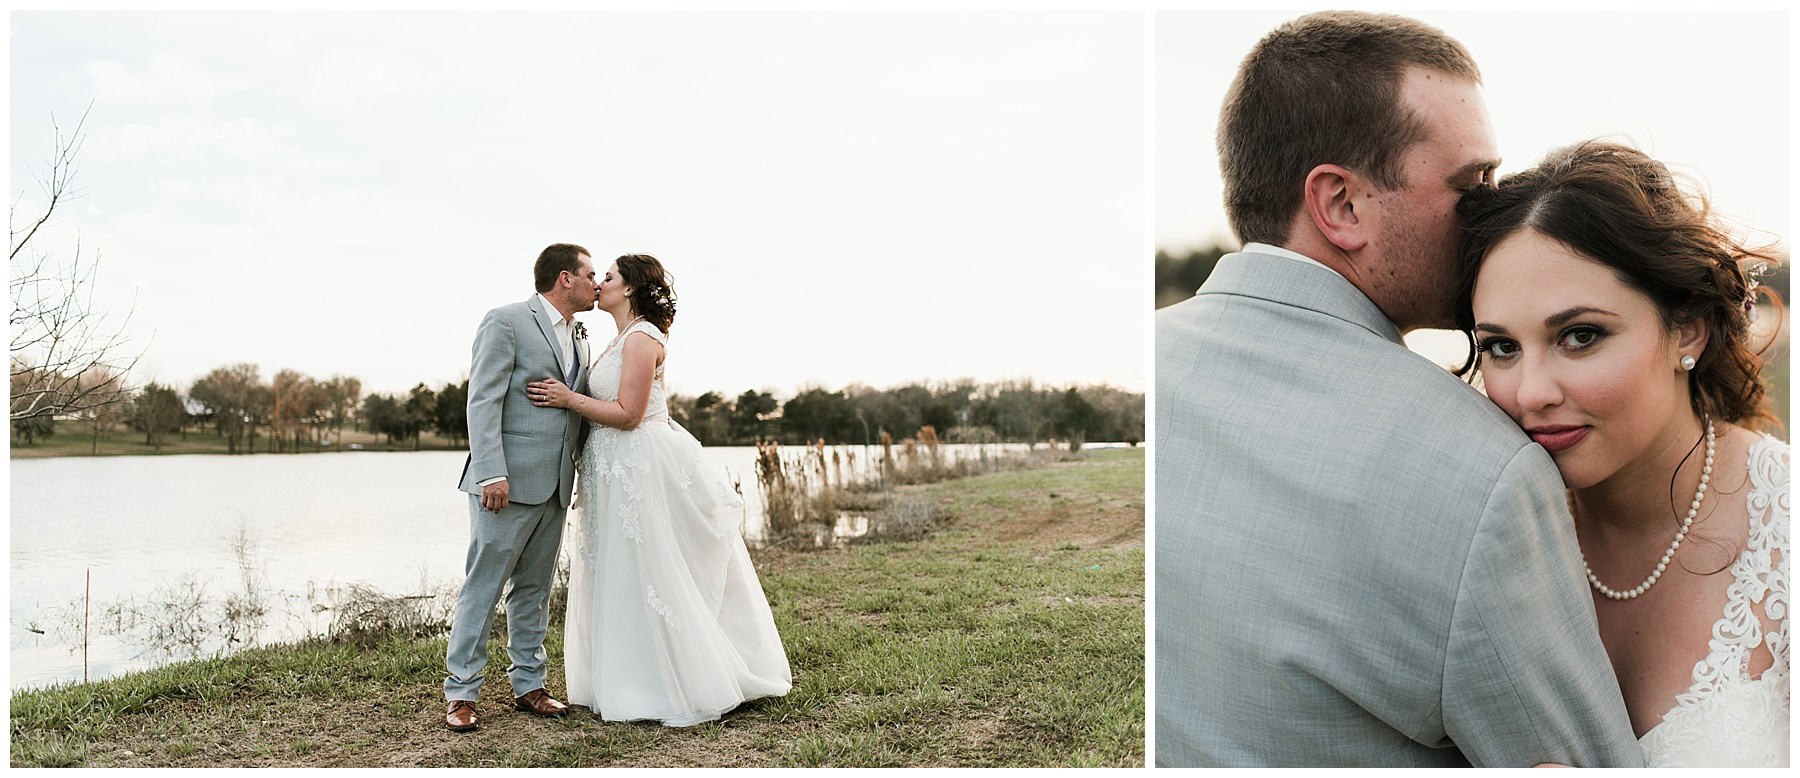 chandlers-garden-celina-wedding-amber-stephen-18.jpg